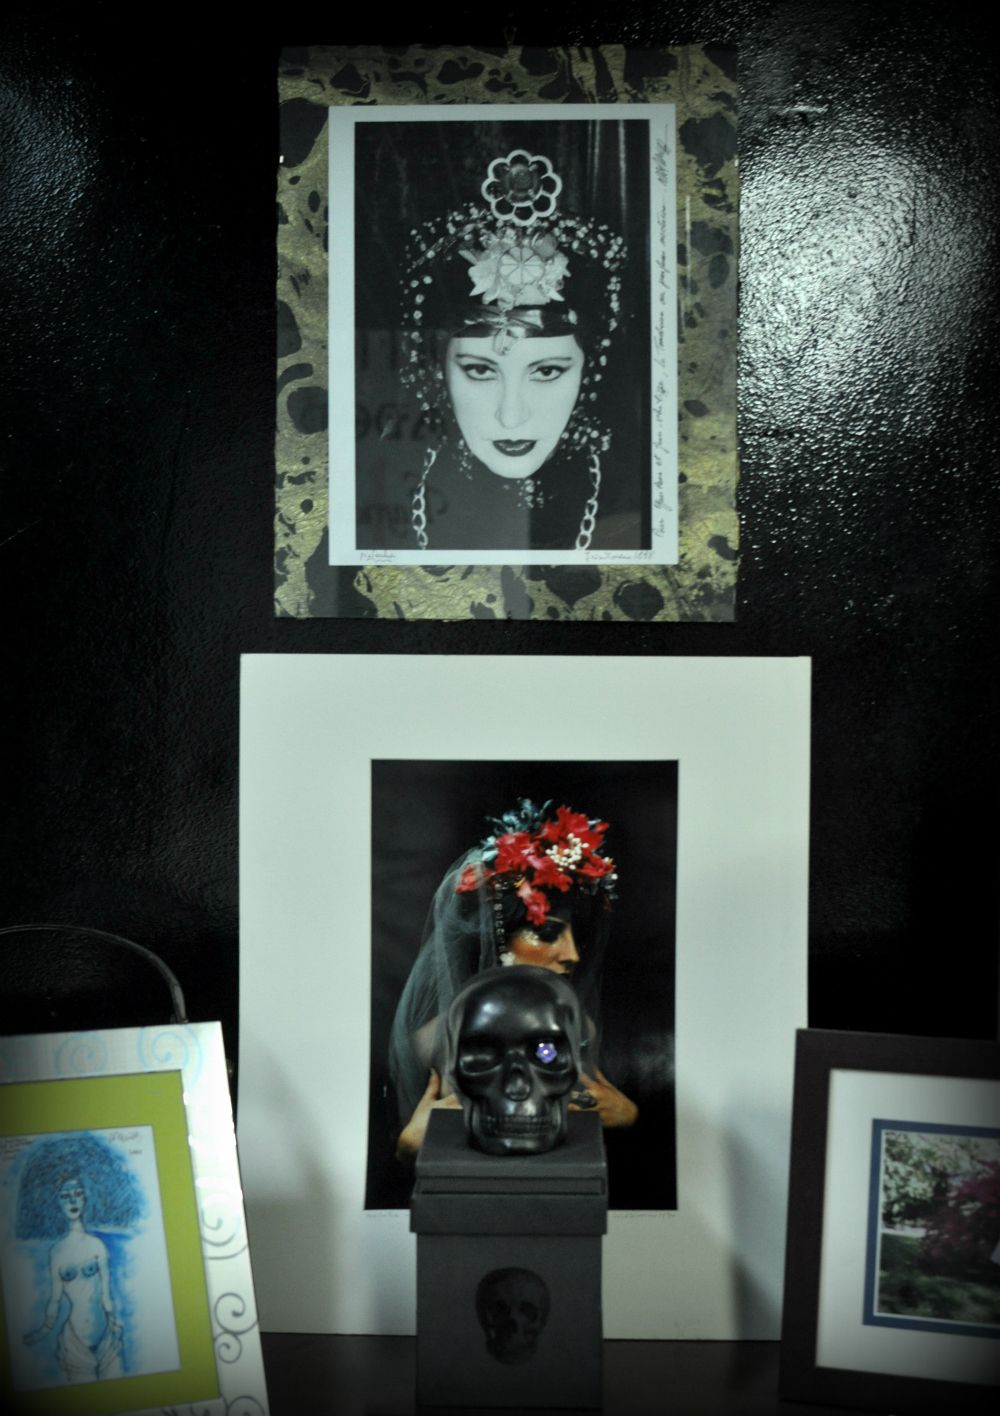 Gavilane Paris Show room Natacha van beverloo Corneille Irina Ionesco photos